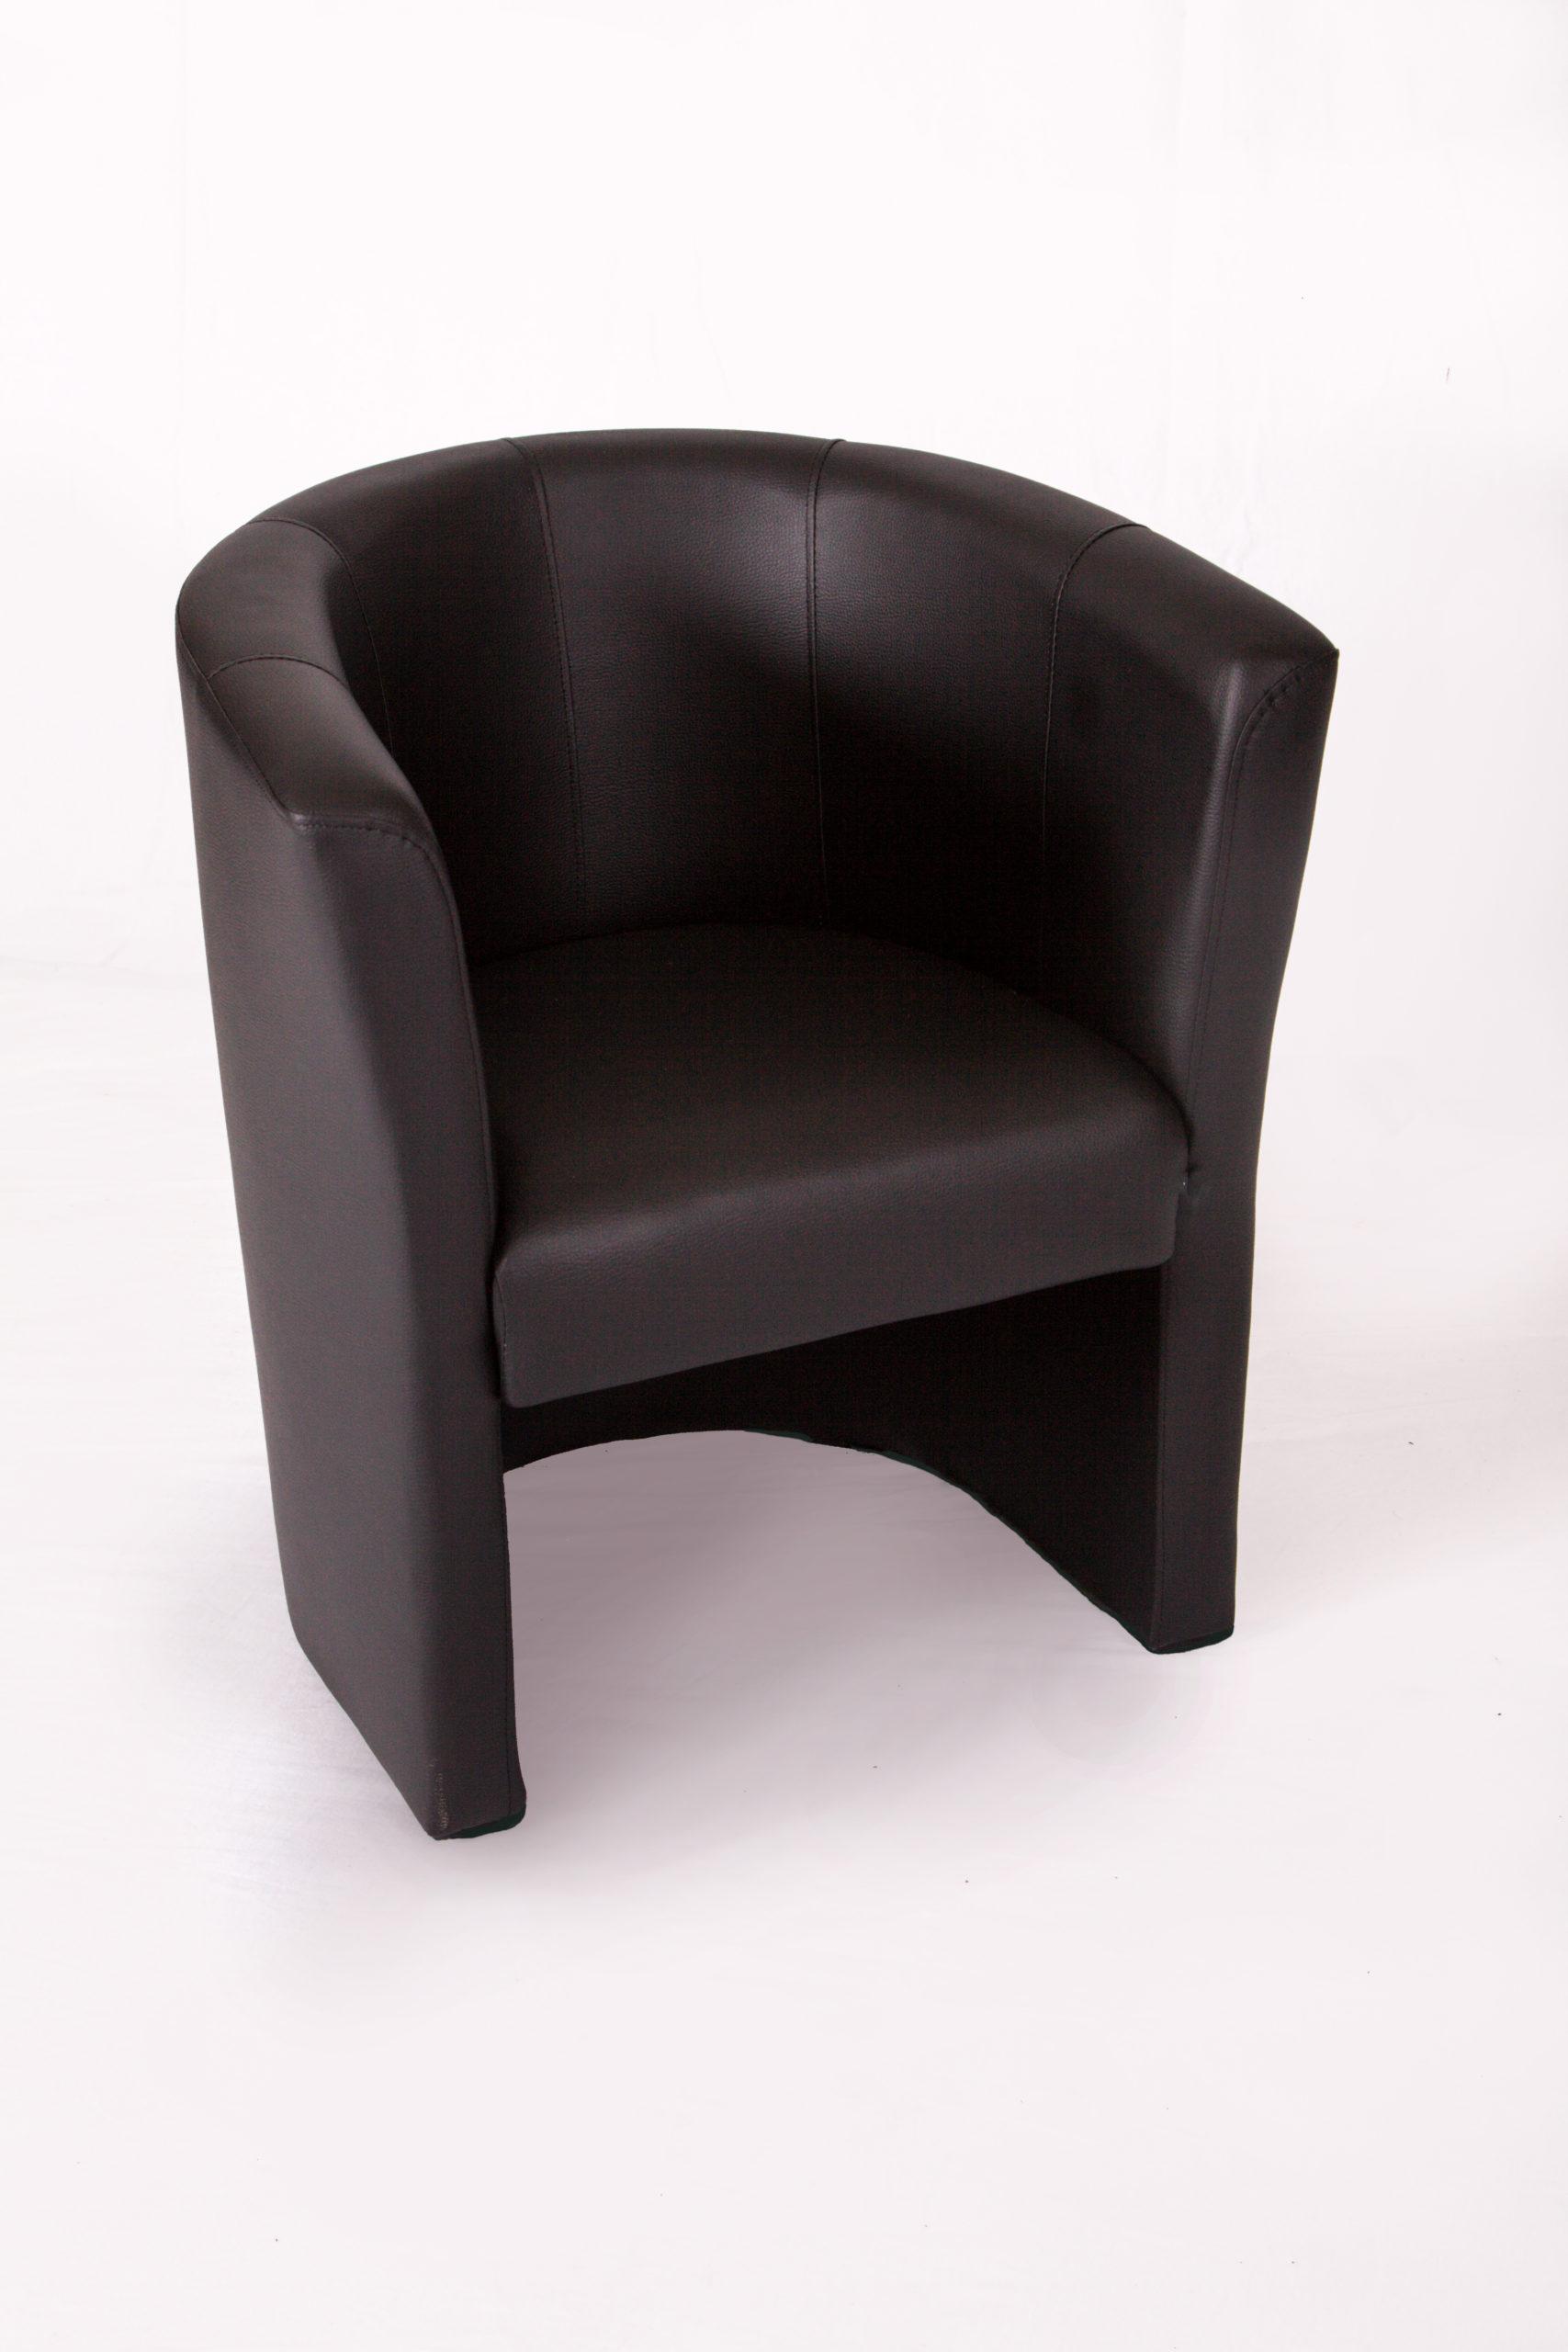 Loungesessel Sessel schwarz